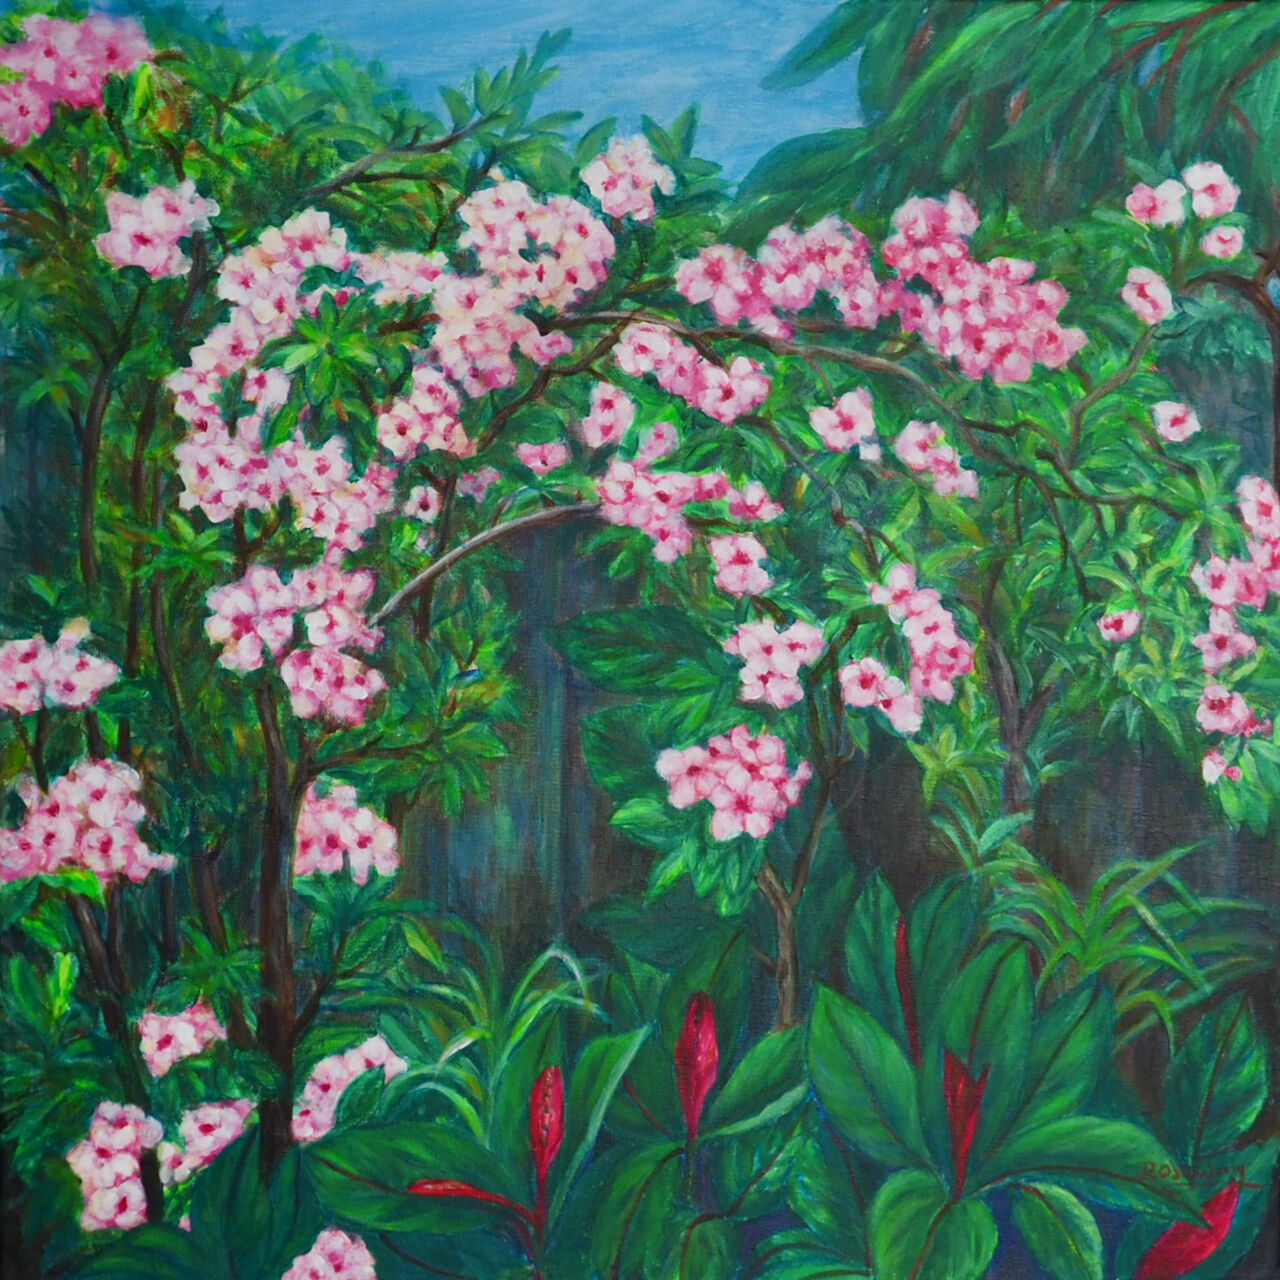 Rosa%20CHoy_Garden%20Flowers